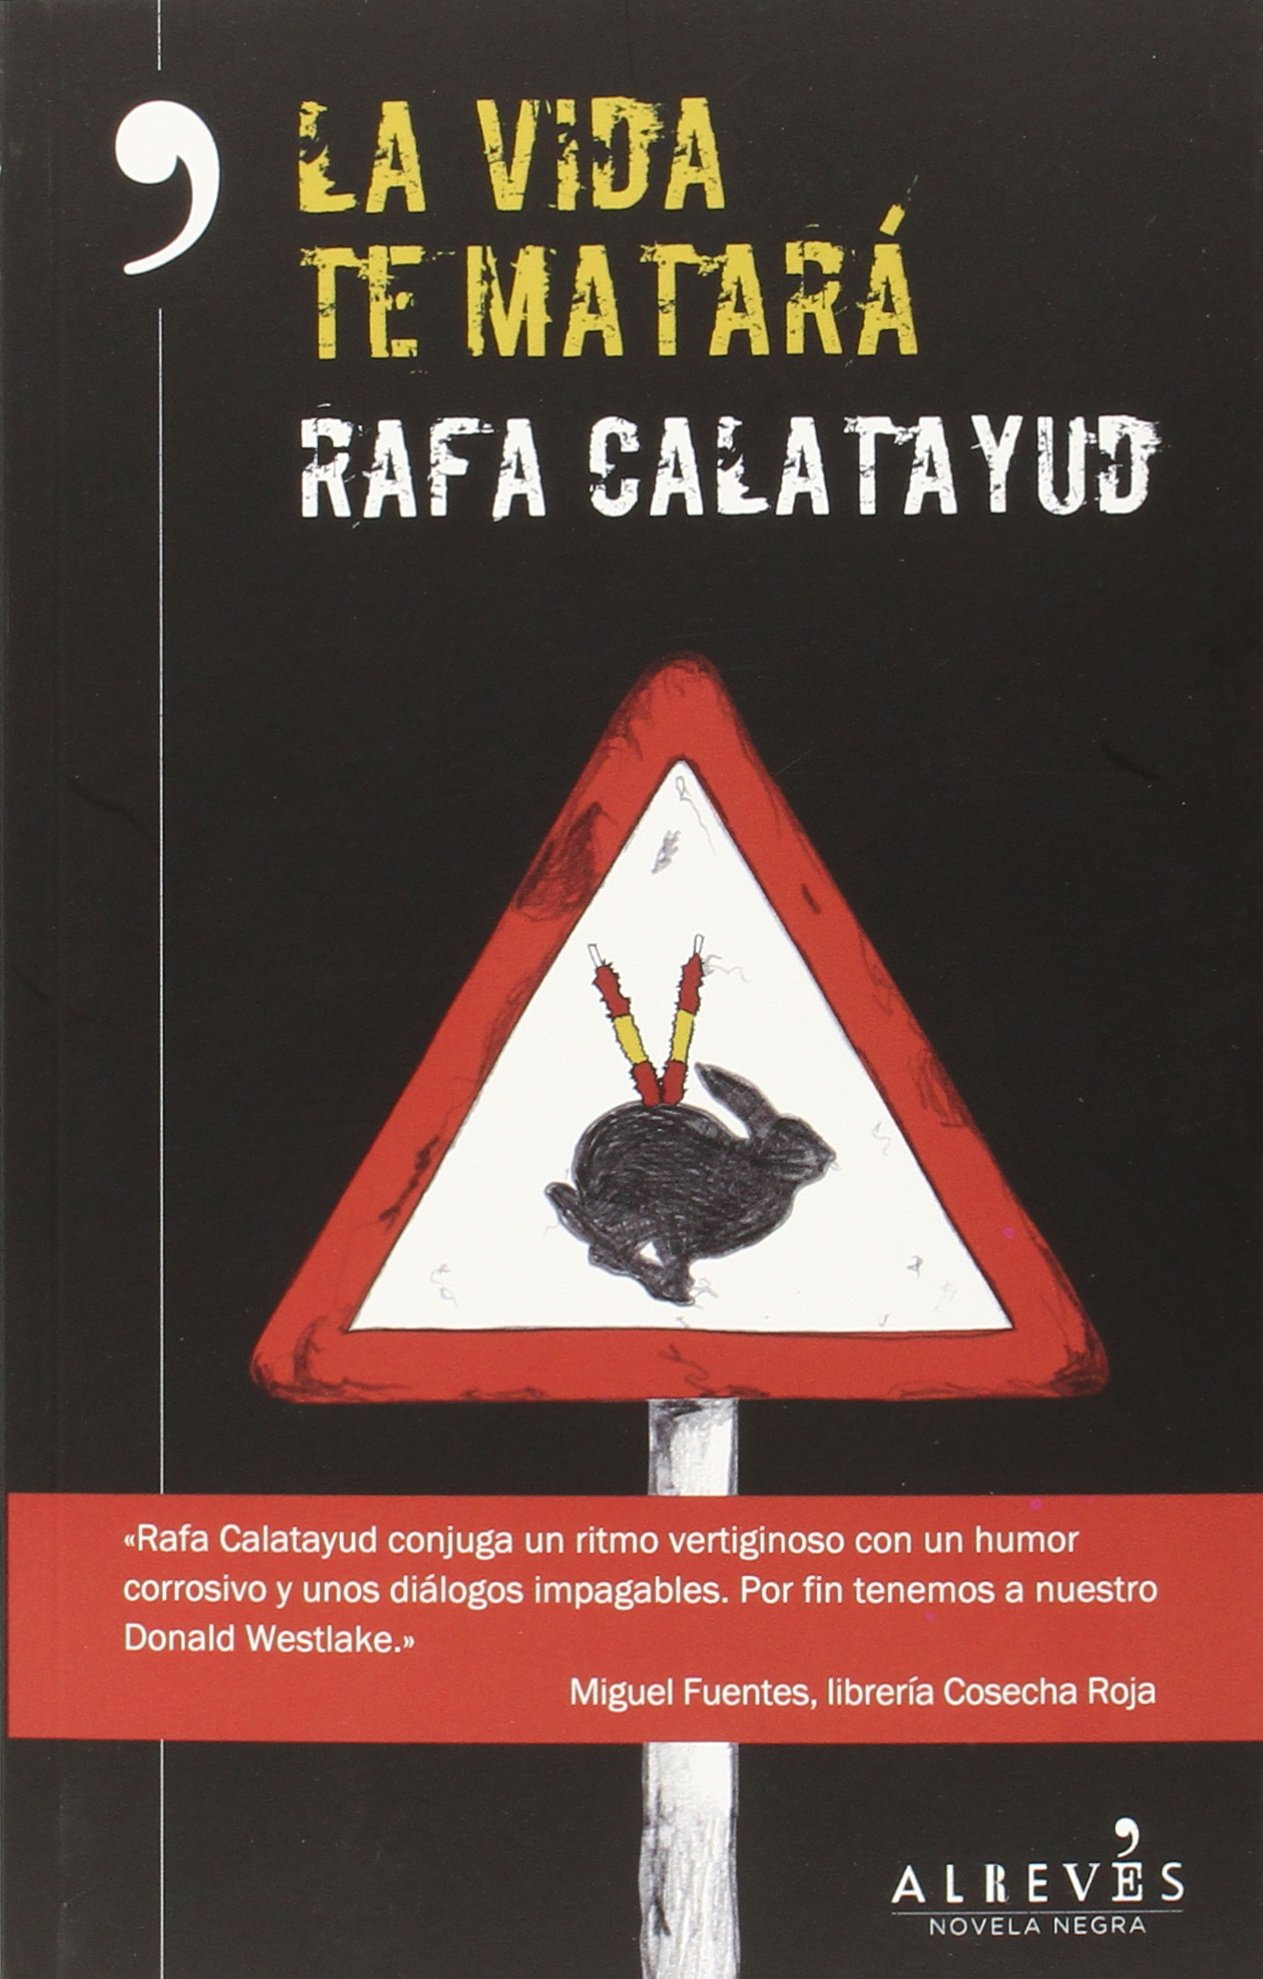 La vida te matará (NOVELA NEGRA): Amazon.es: Calatayud Cano, Rafa ...